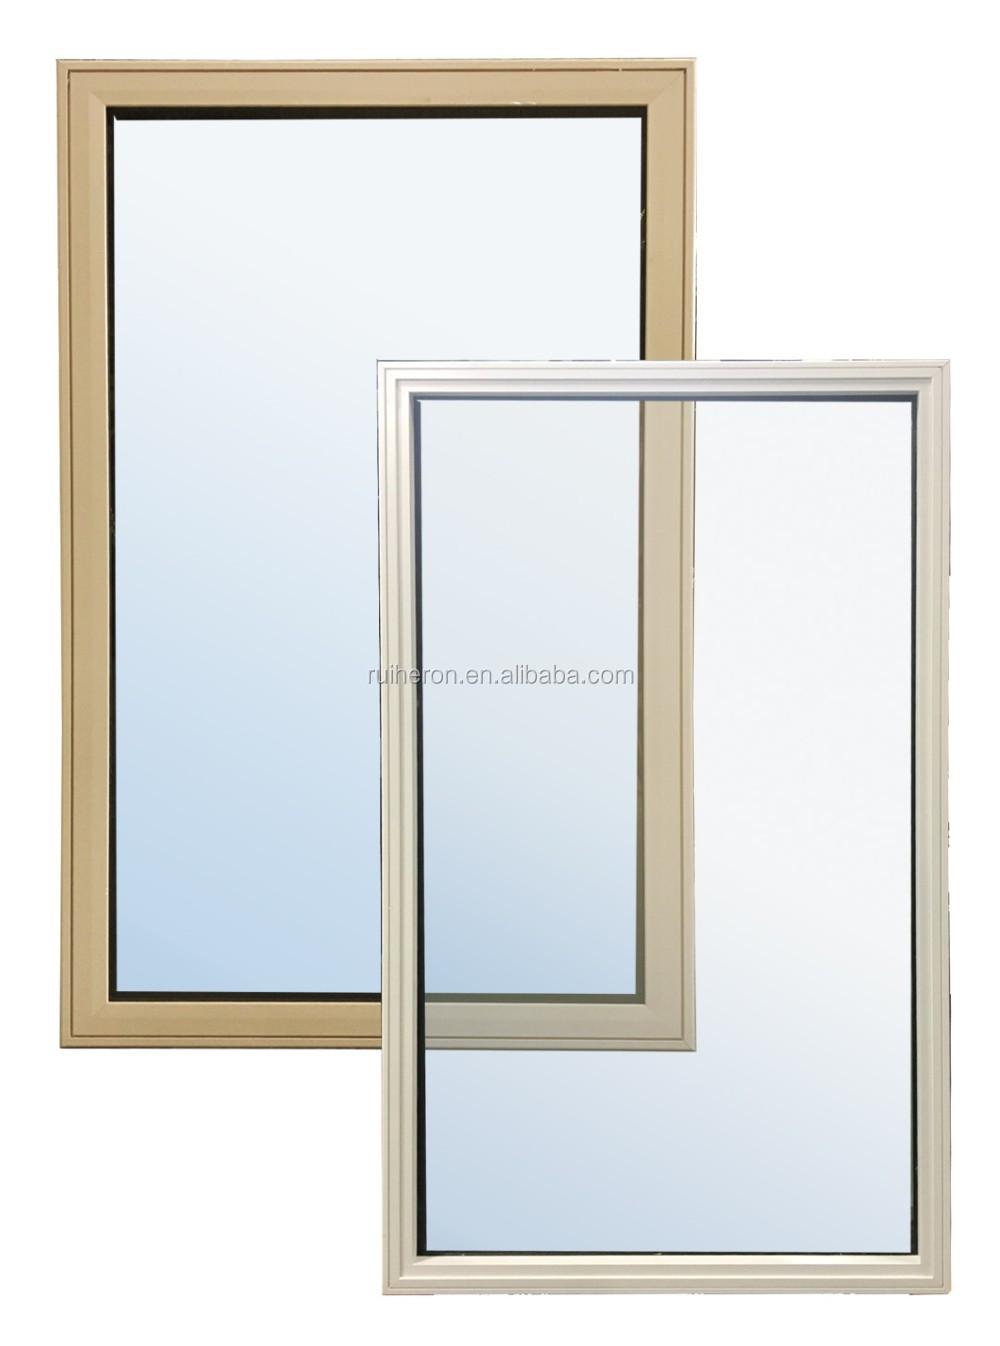 Metal Frame Window Panels : Aluminum frame glass fixed panel window buy